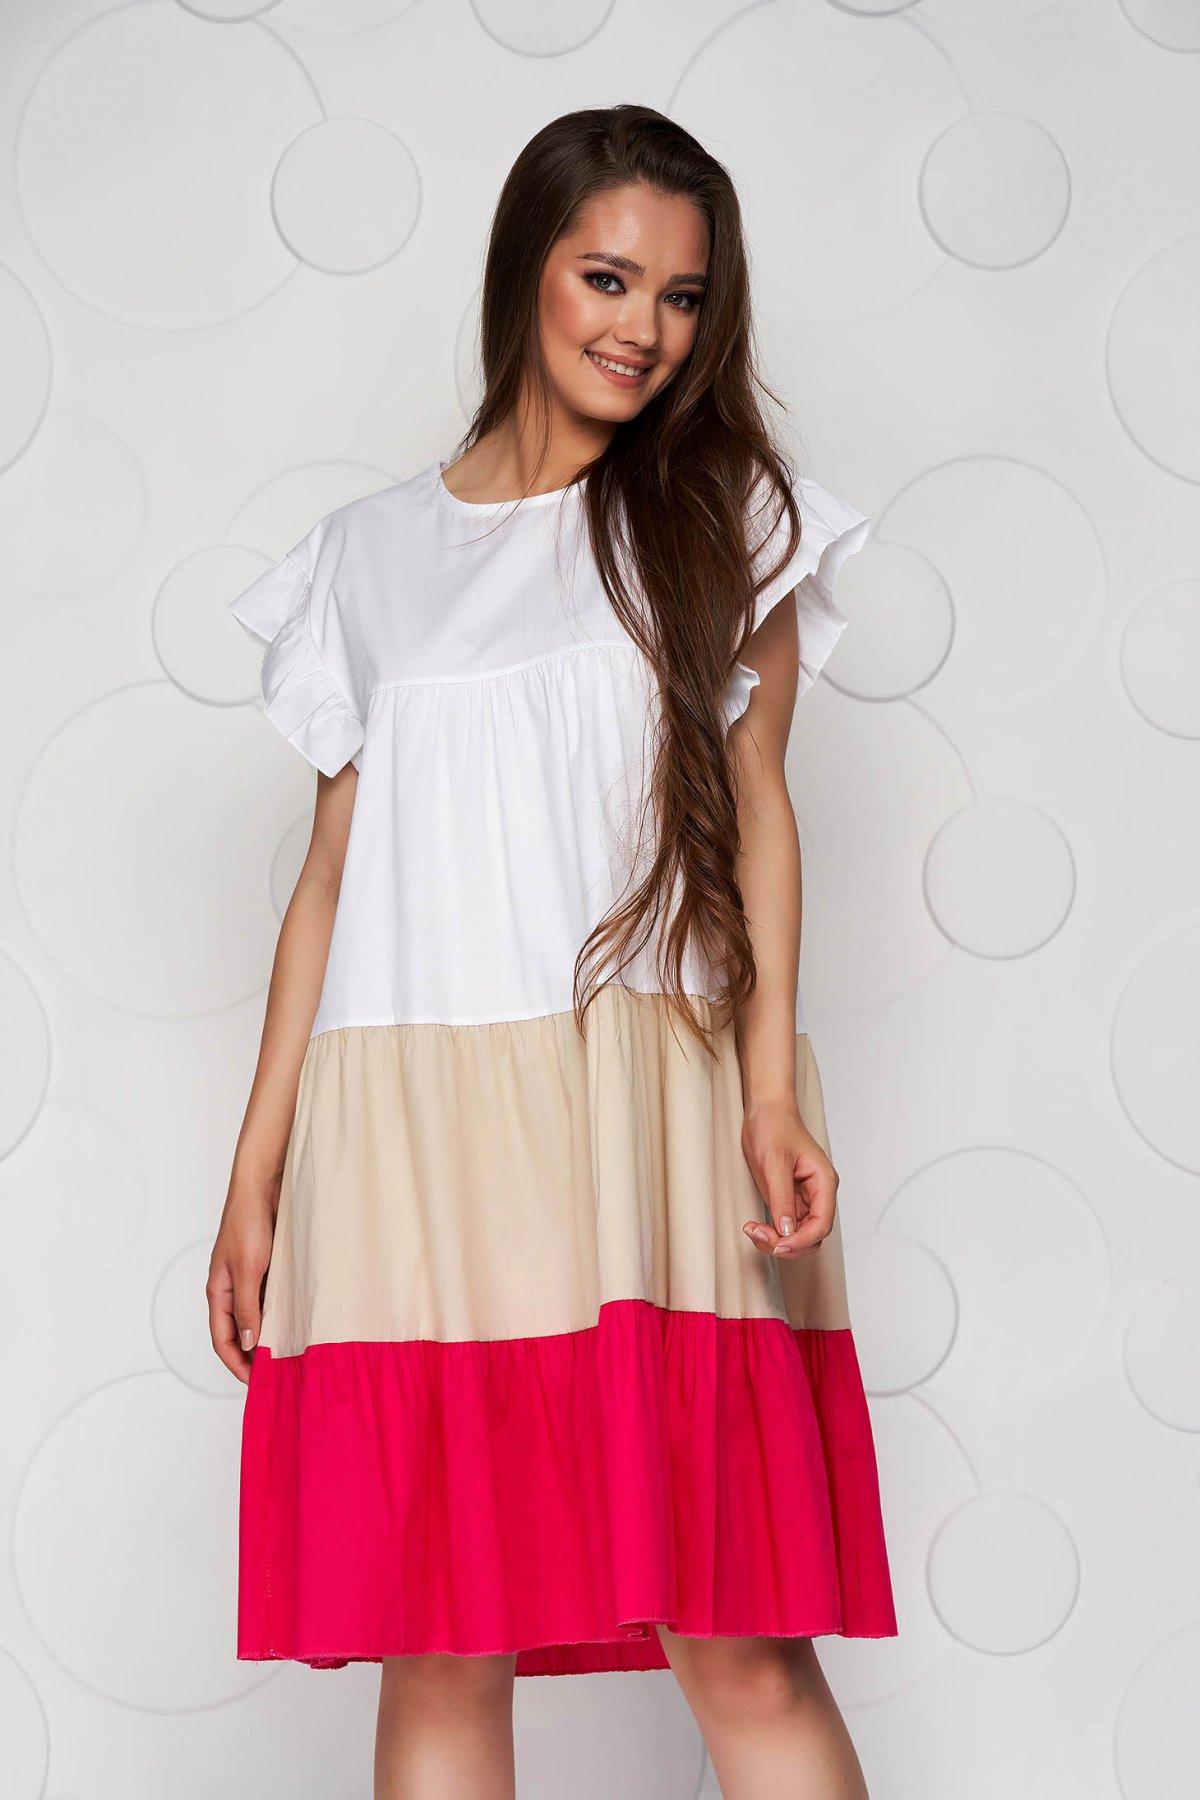 Rochie alba cu roz din material vaporos si subtire cu croi larg midi cu volanase - medelin.ro